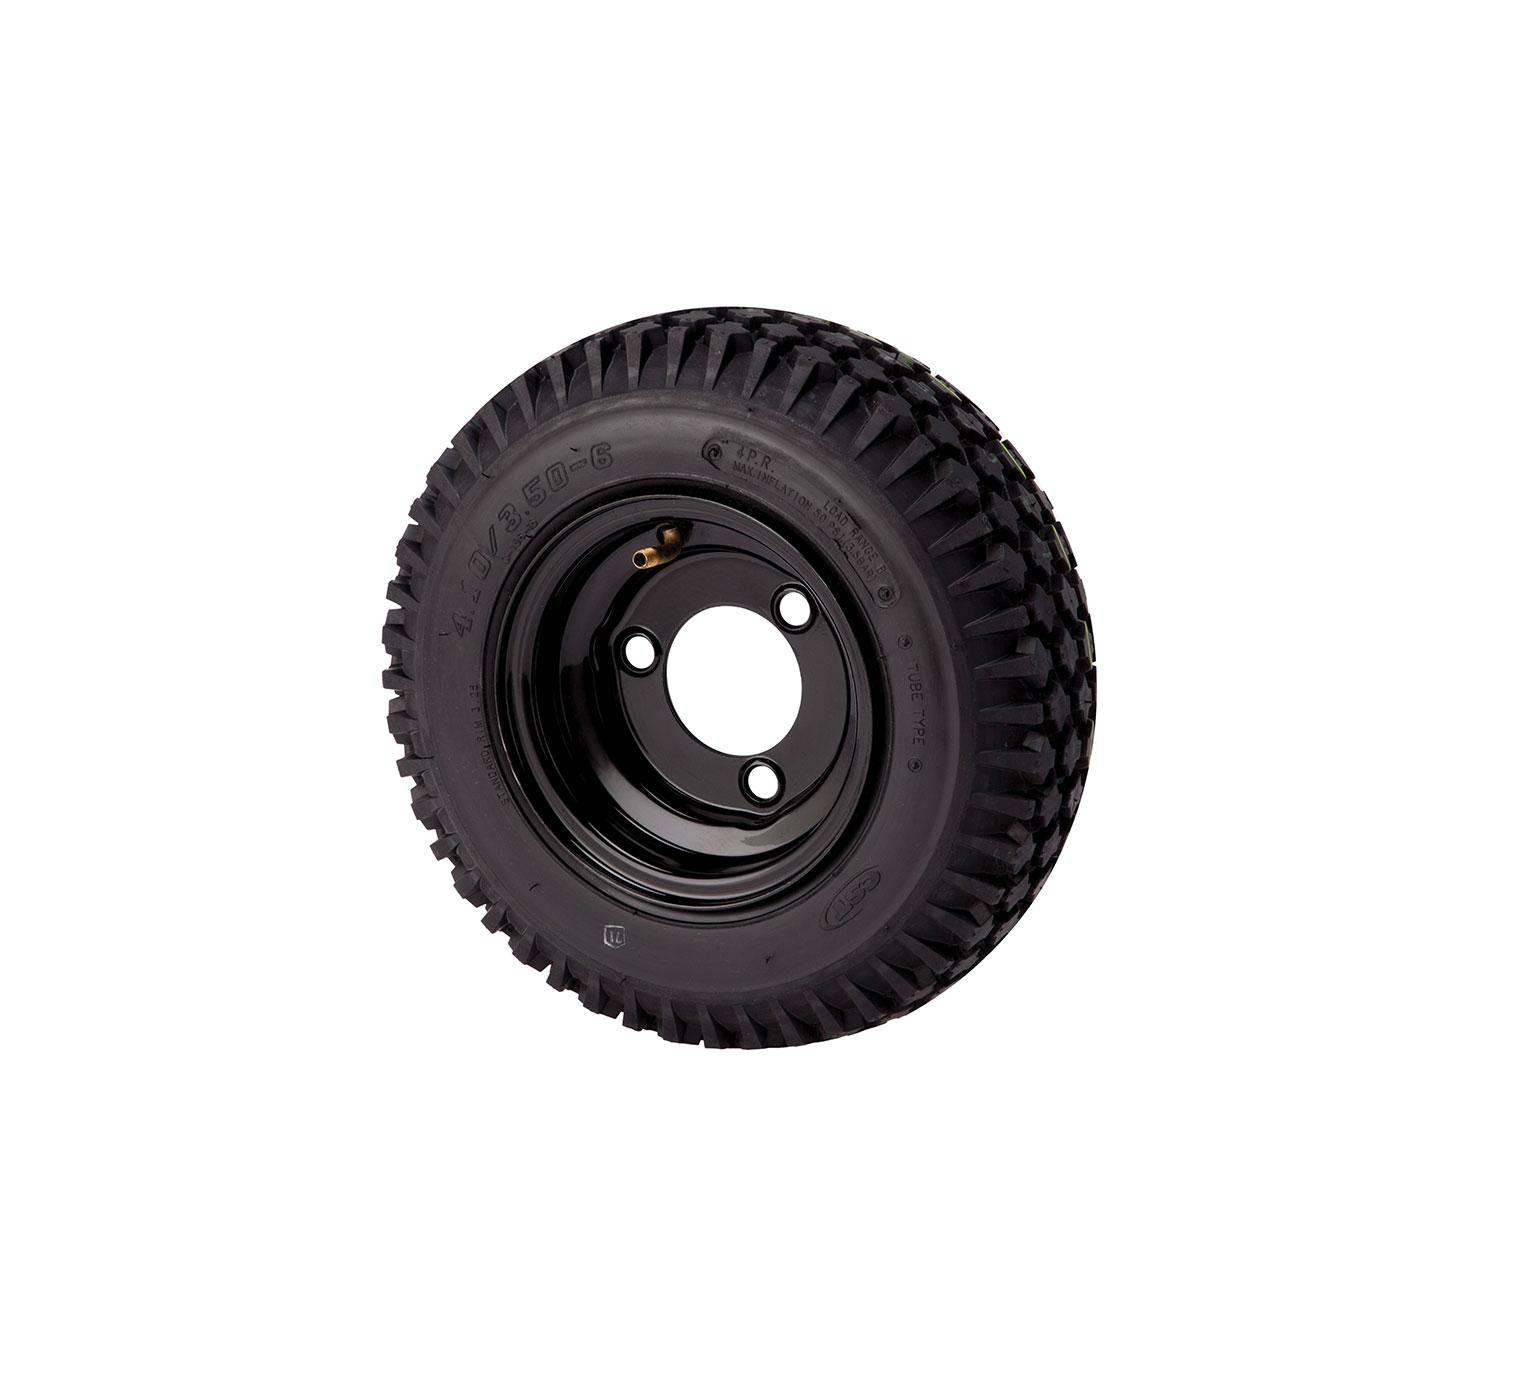 3 Bolt Polyurethane Foam Filled Tire Assembly 1052674